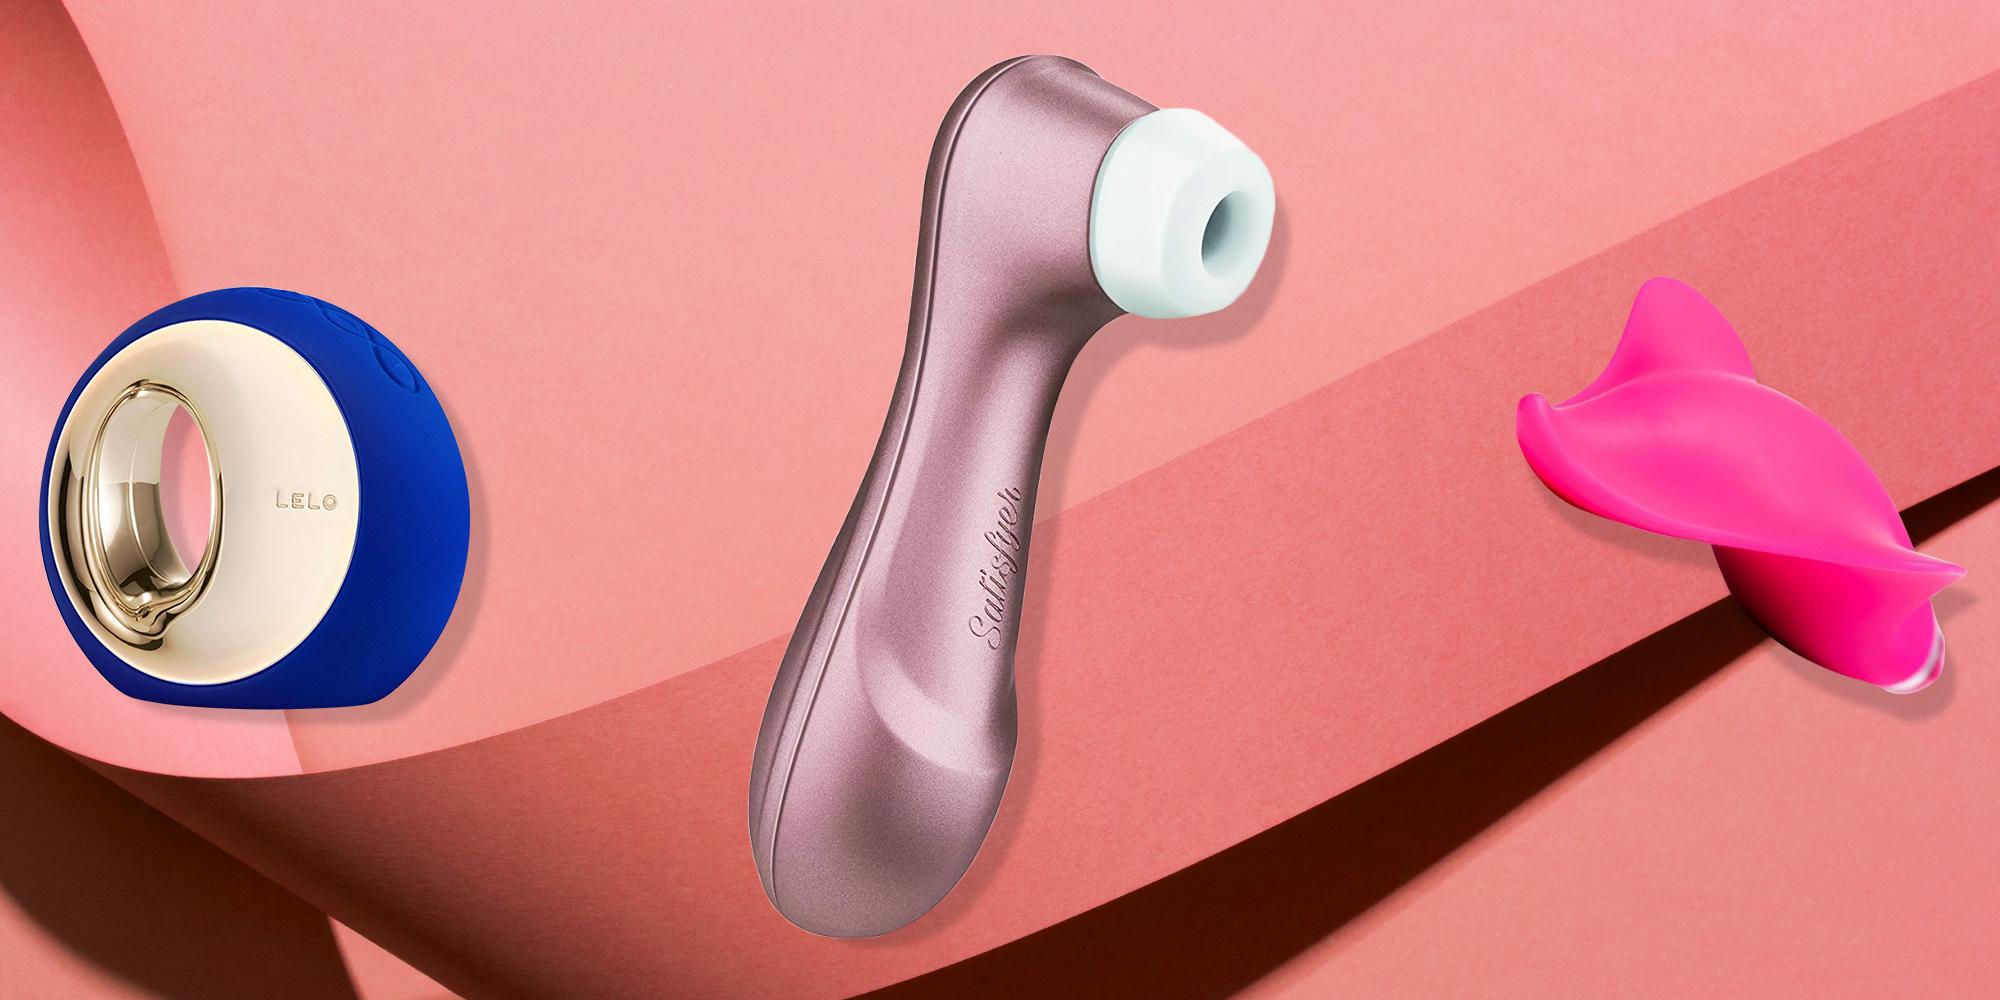 Oral sex simulators for women